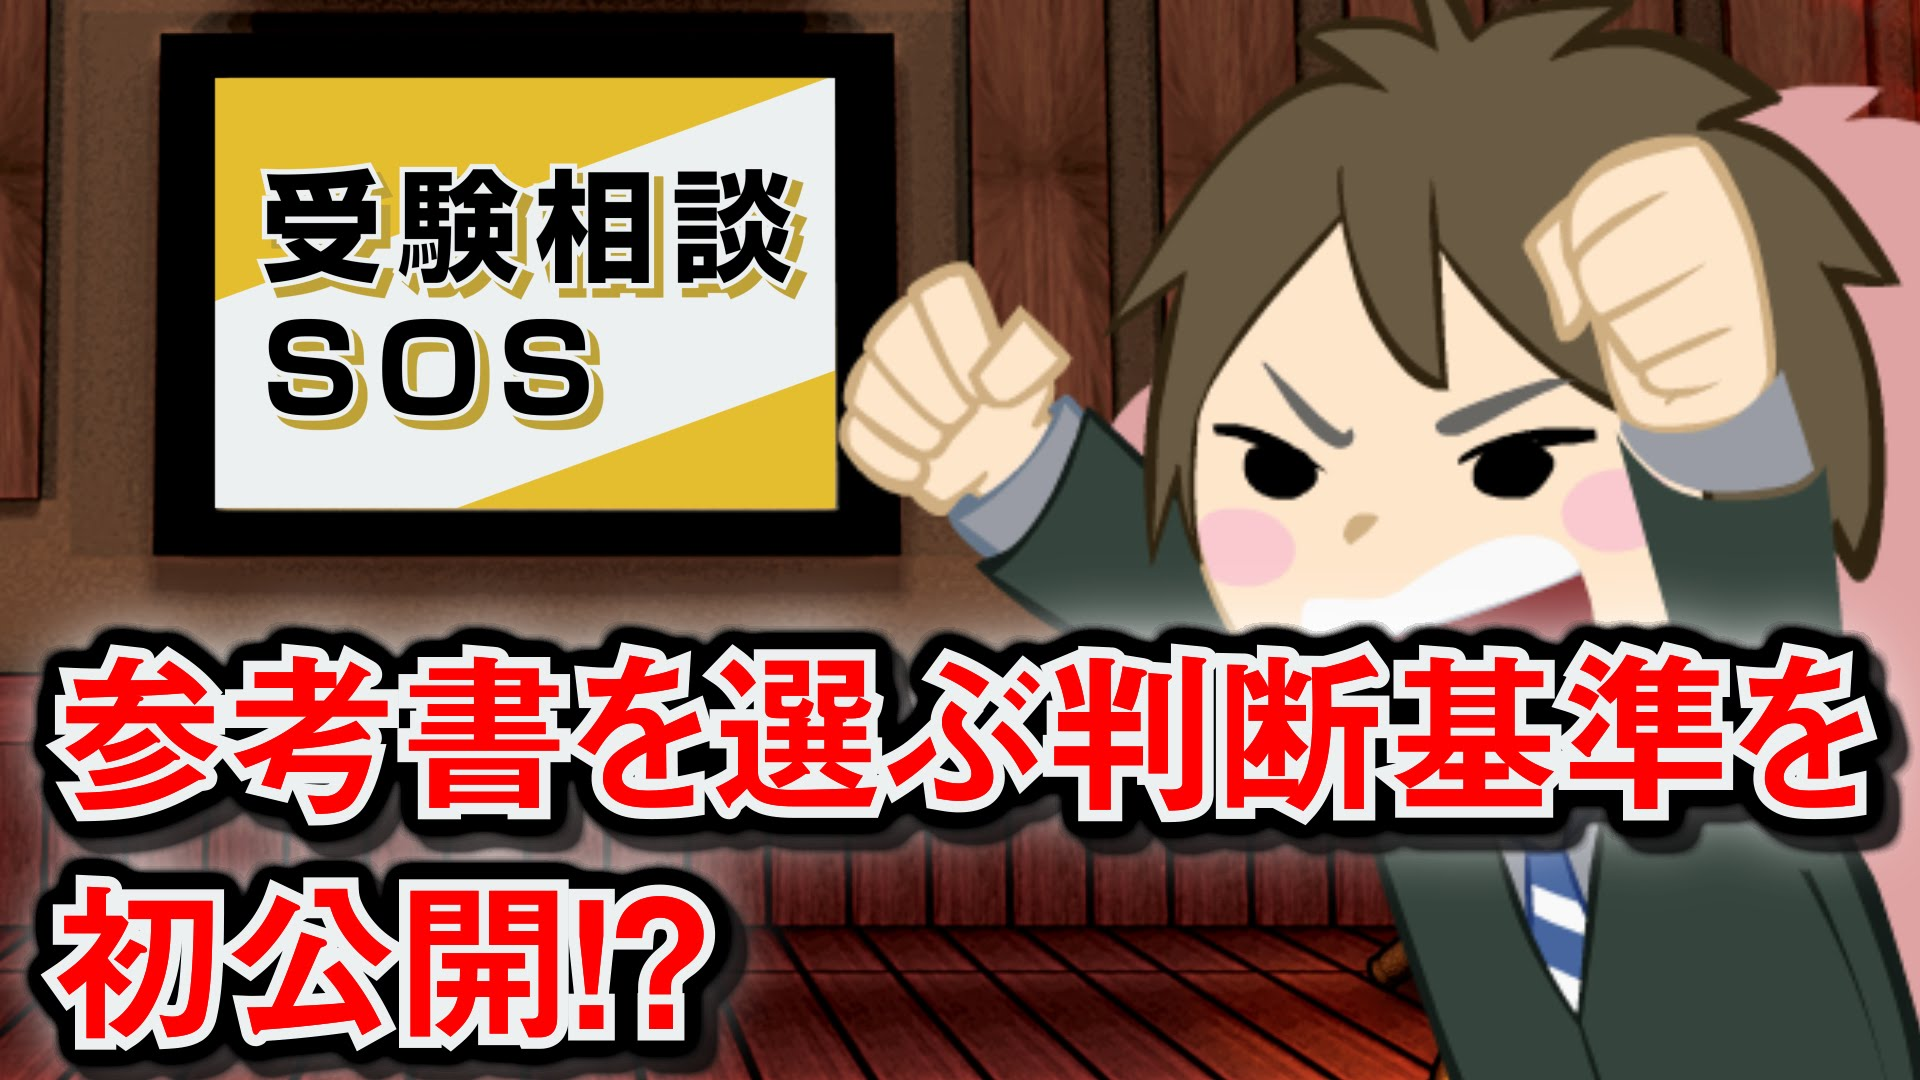 【vol.72】参考書を選ぶ判断基準を初公開!?|受験相談SOS